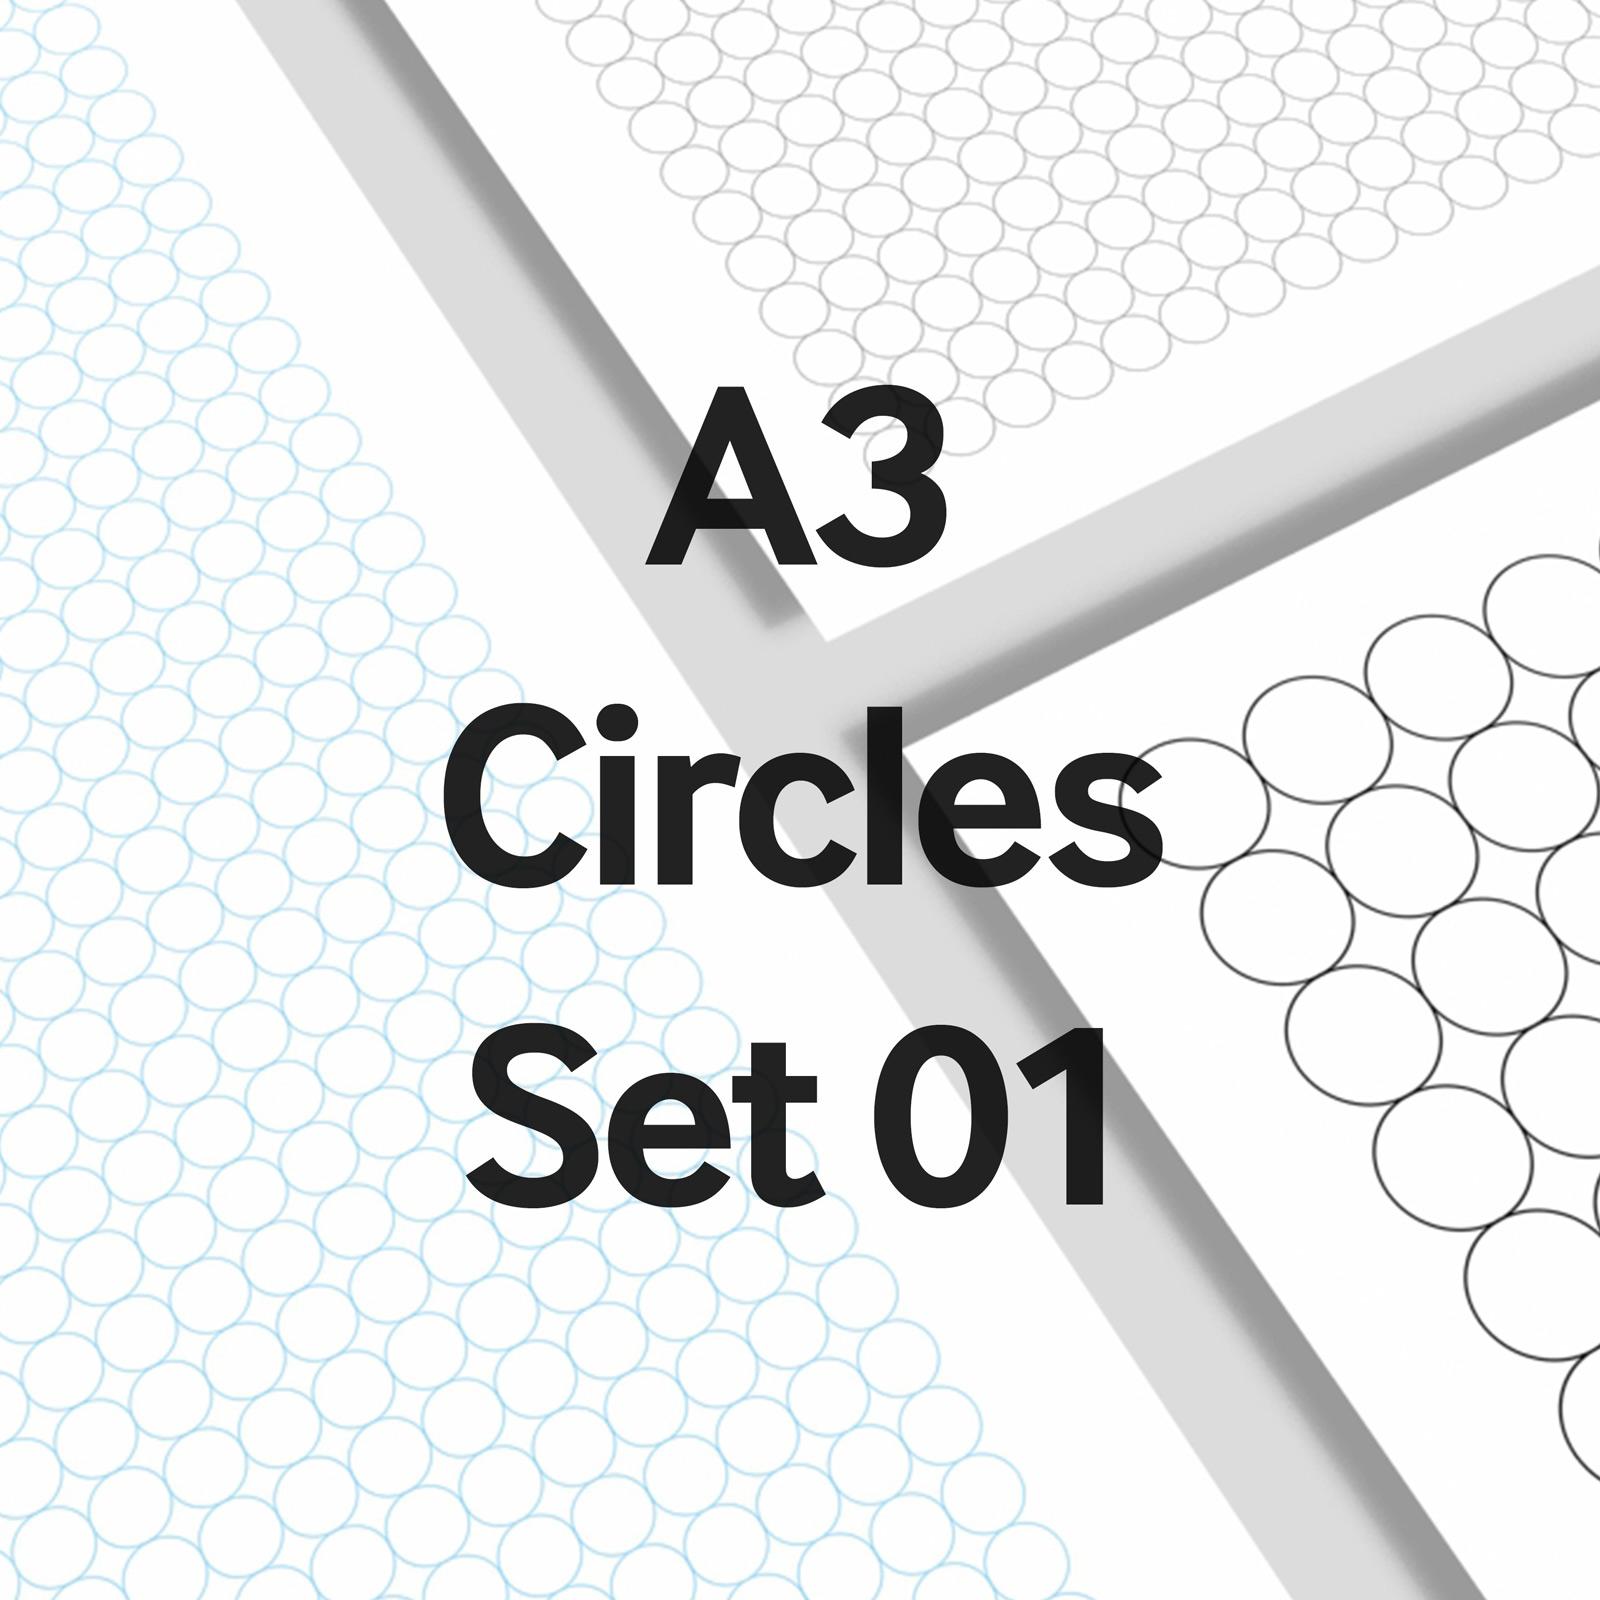 We Love Grids® A3 Circles Set 01